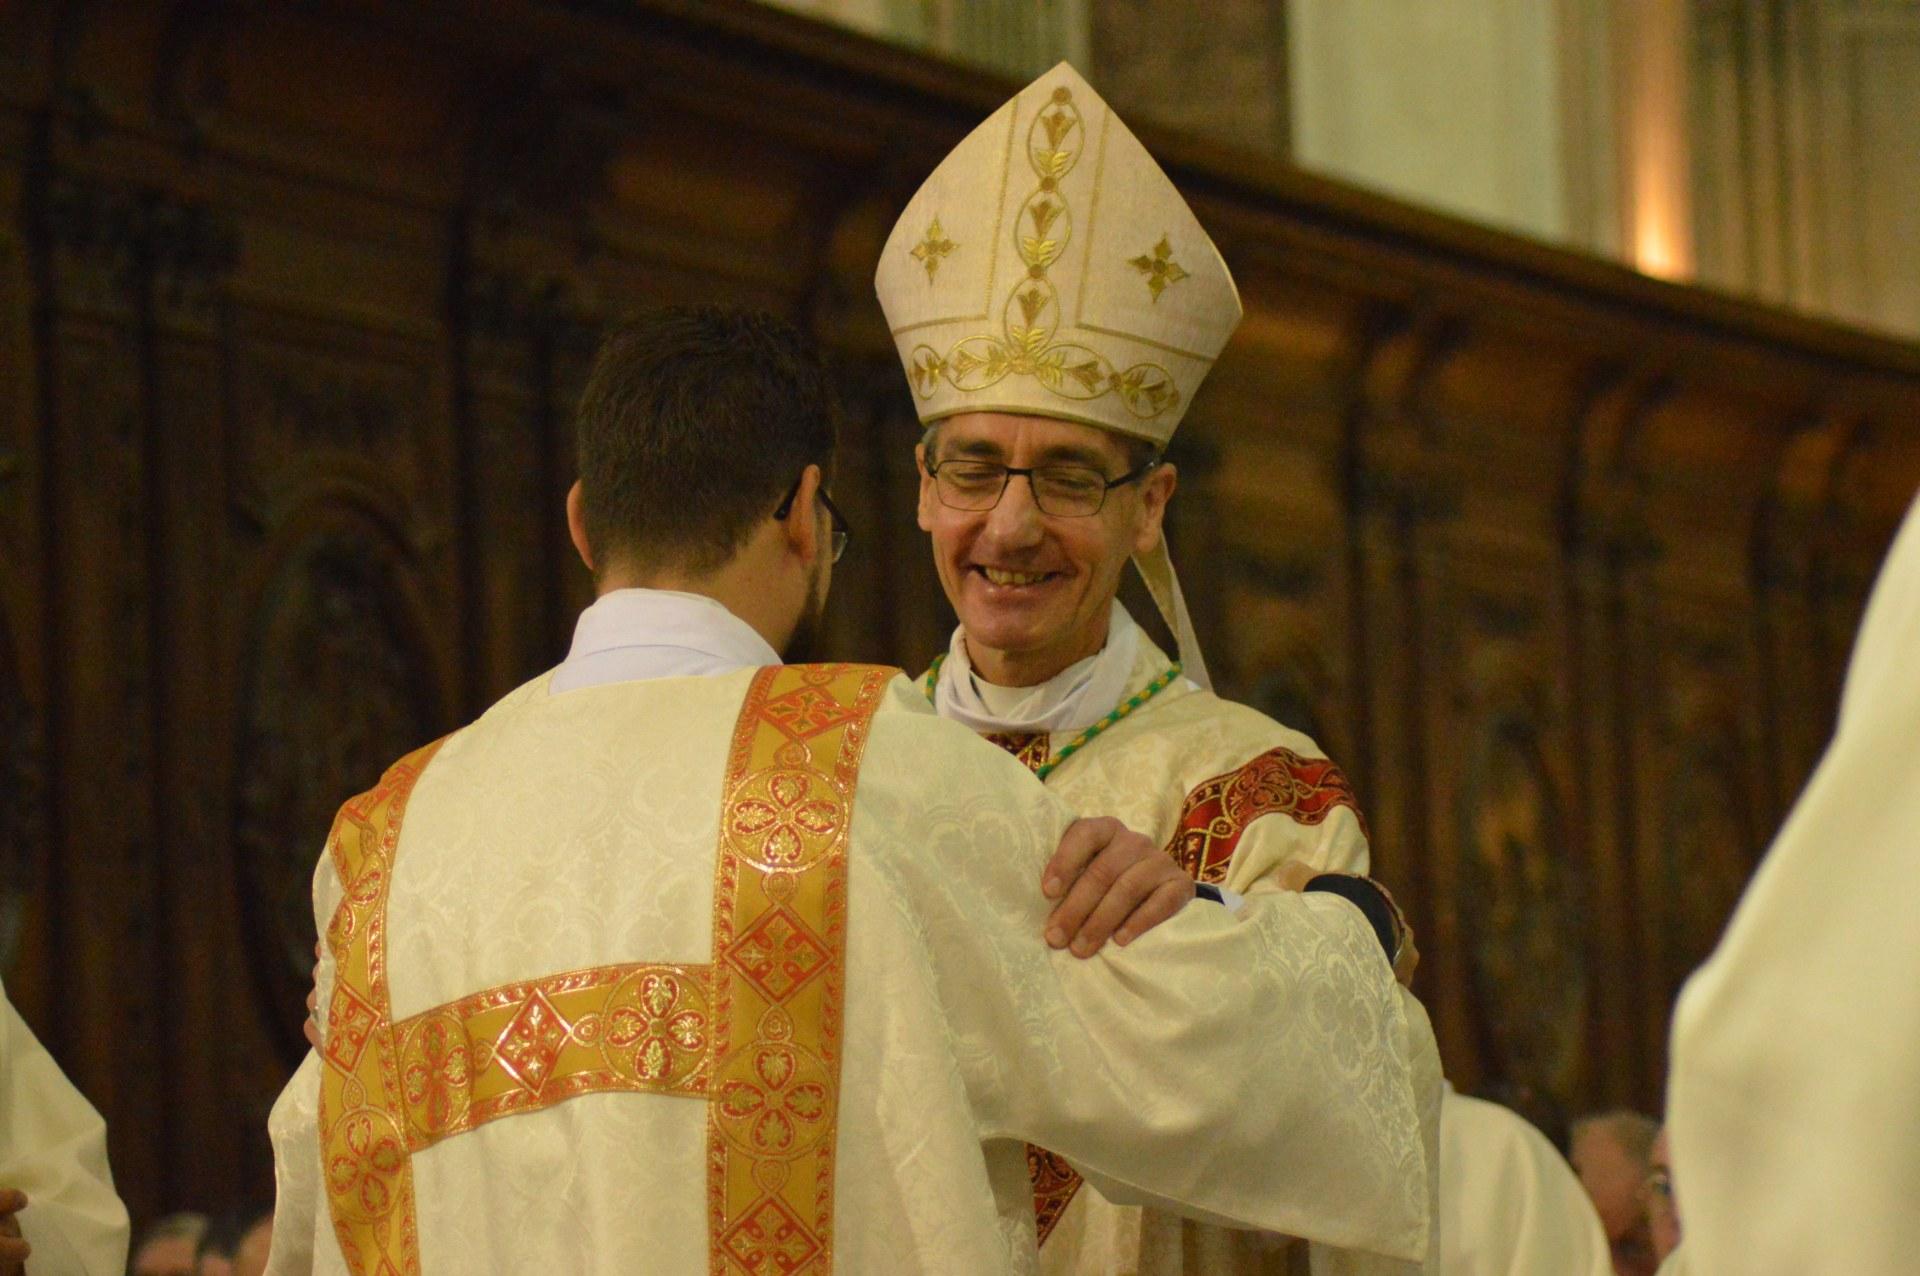 ordination Maxence 54